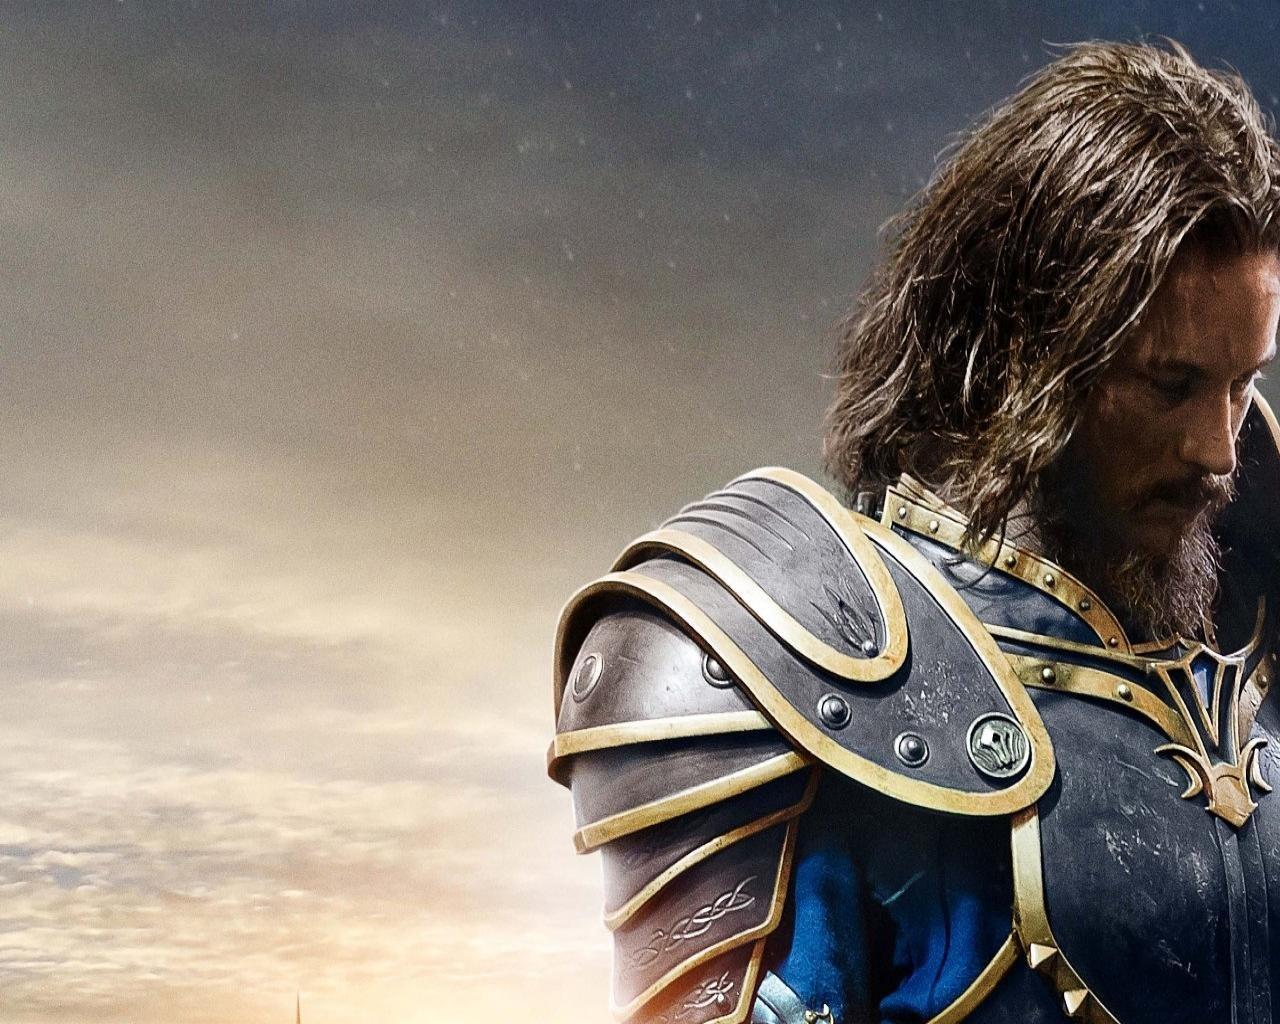 Warcraft Movie Wallpapers 1280x1024 Desktop Backgrounds